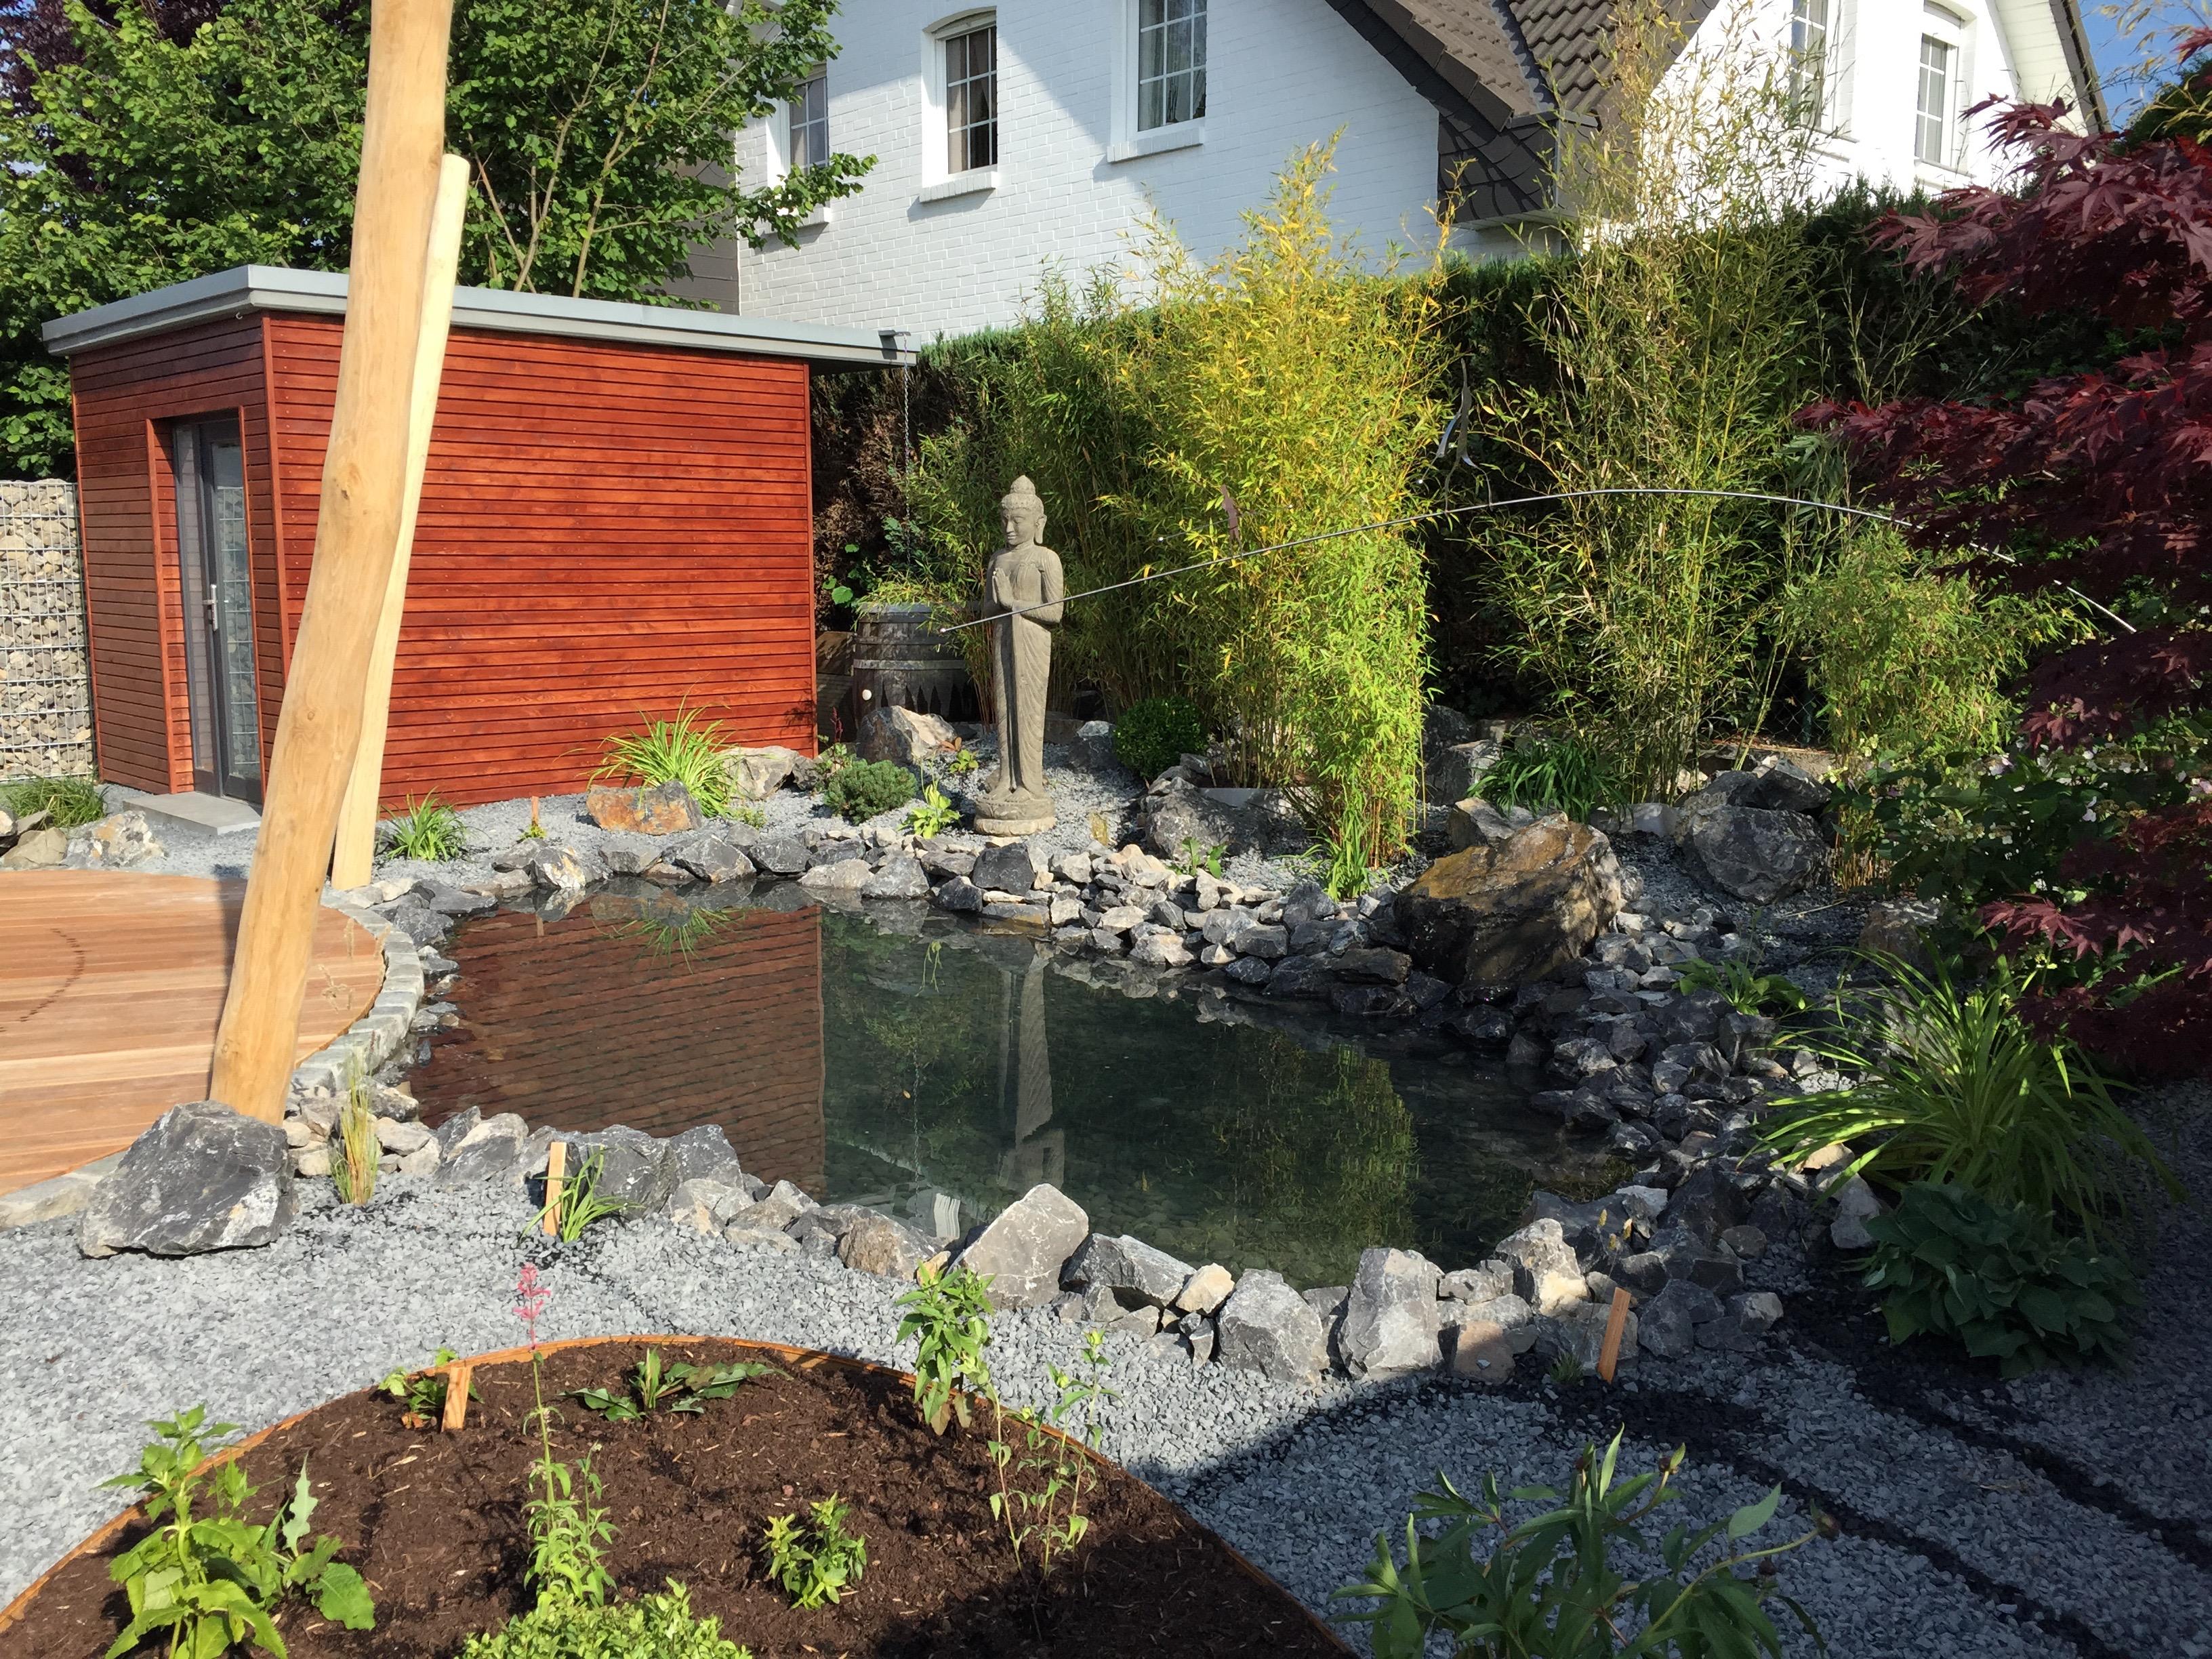 Gartenbau eschweiler asiatisch gartenplanung for Gartengestaltung asiatisch